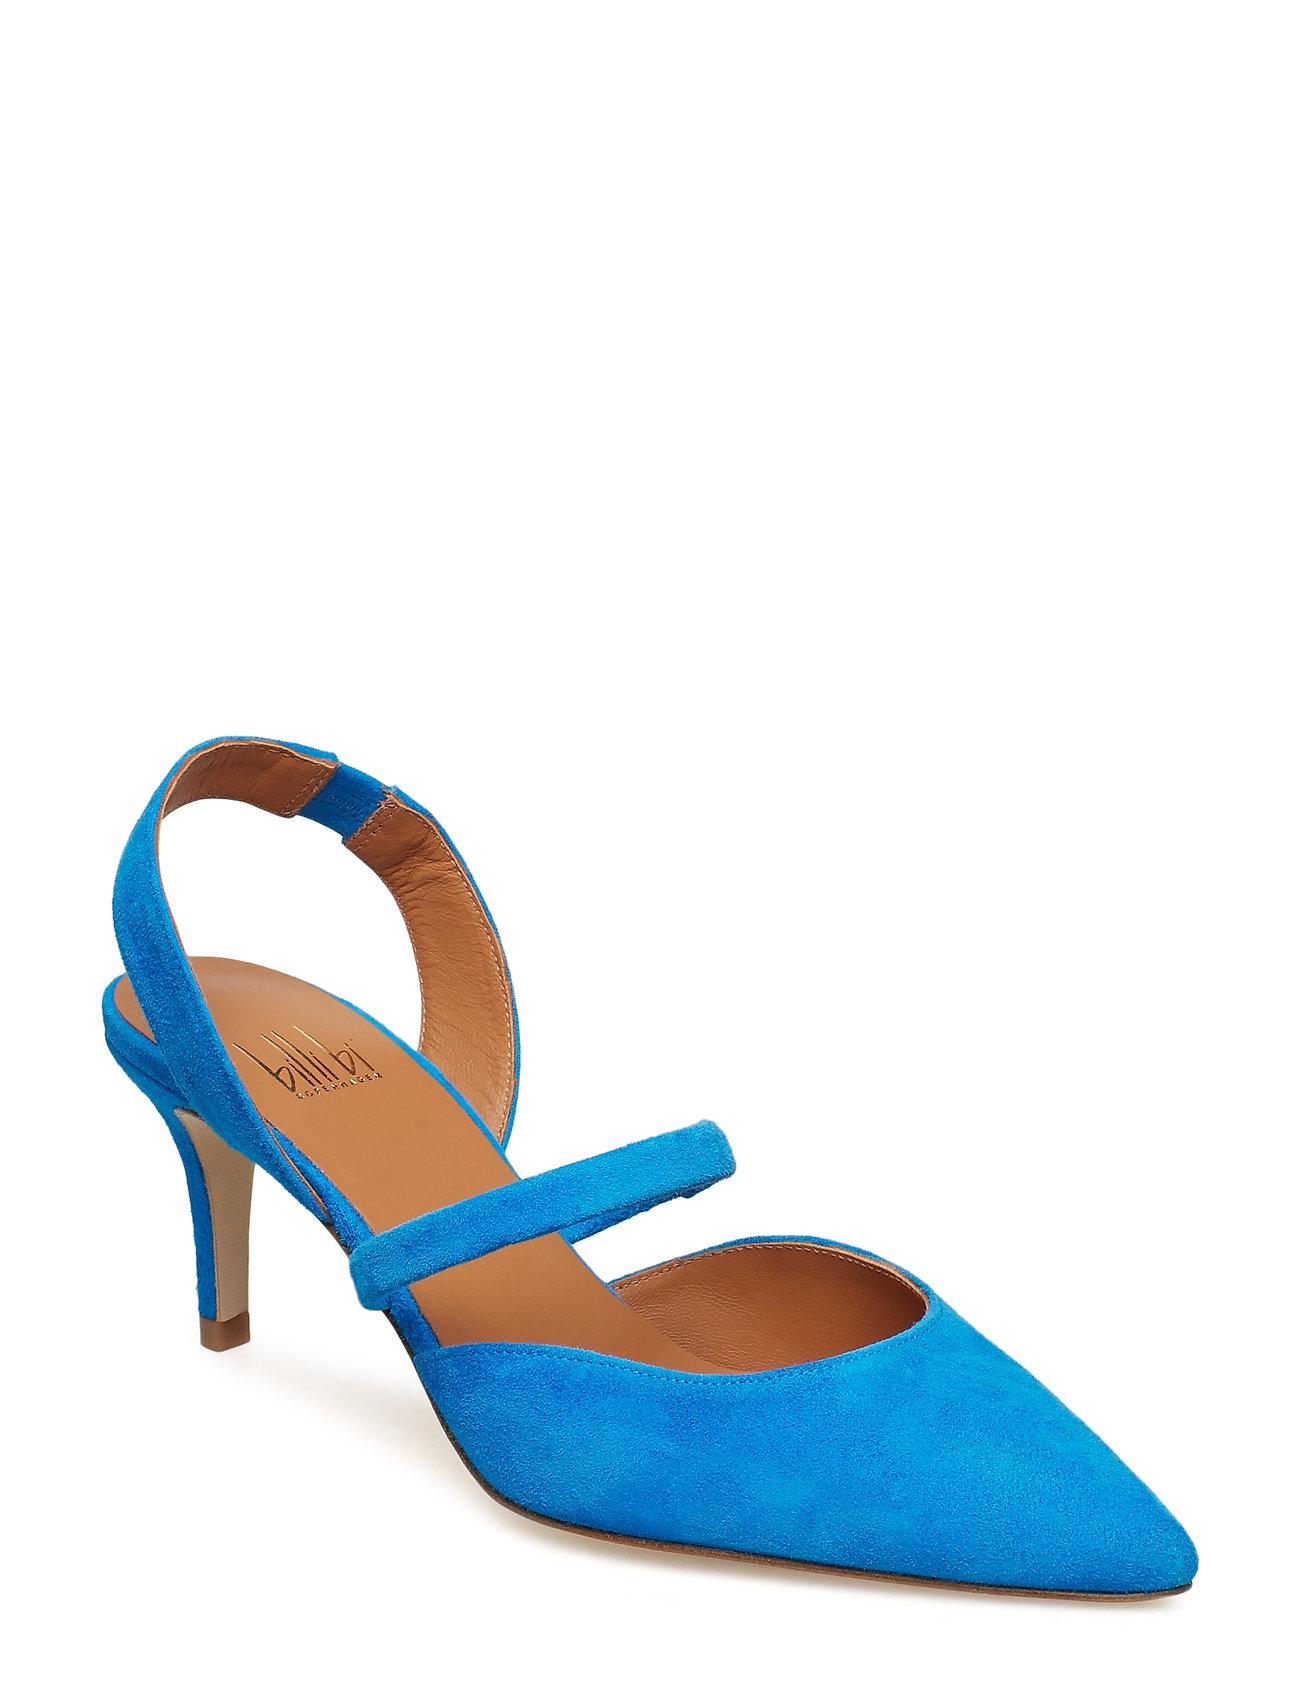 Billi Bi PUMPS 18040 - BLUE MEDITERRANEO SUEDE 515